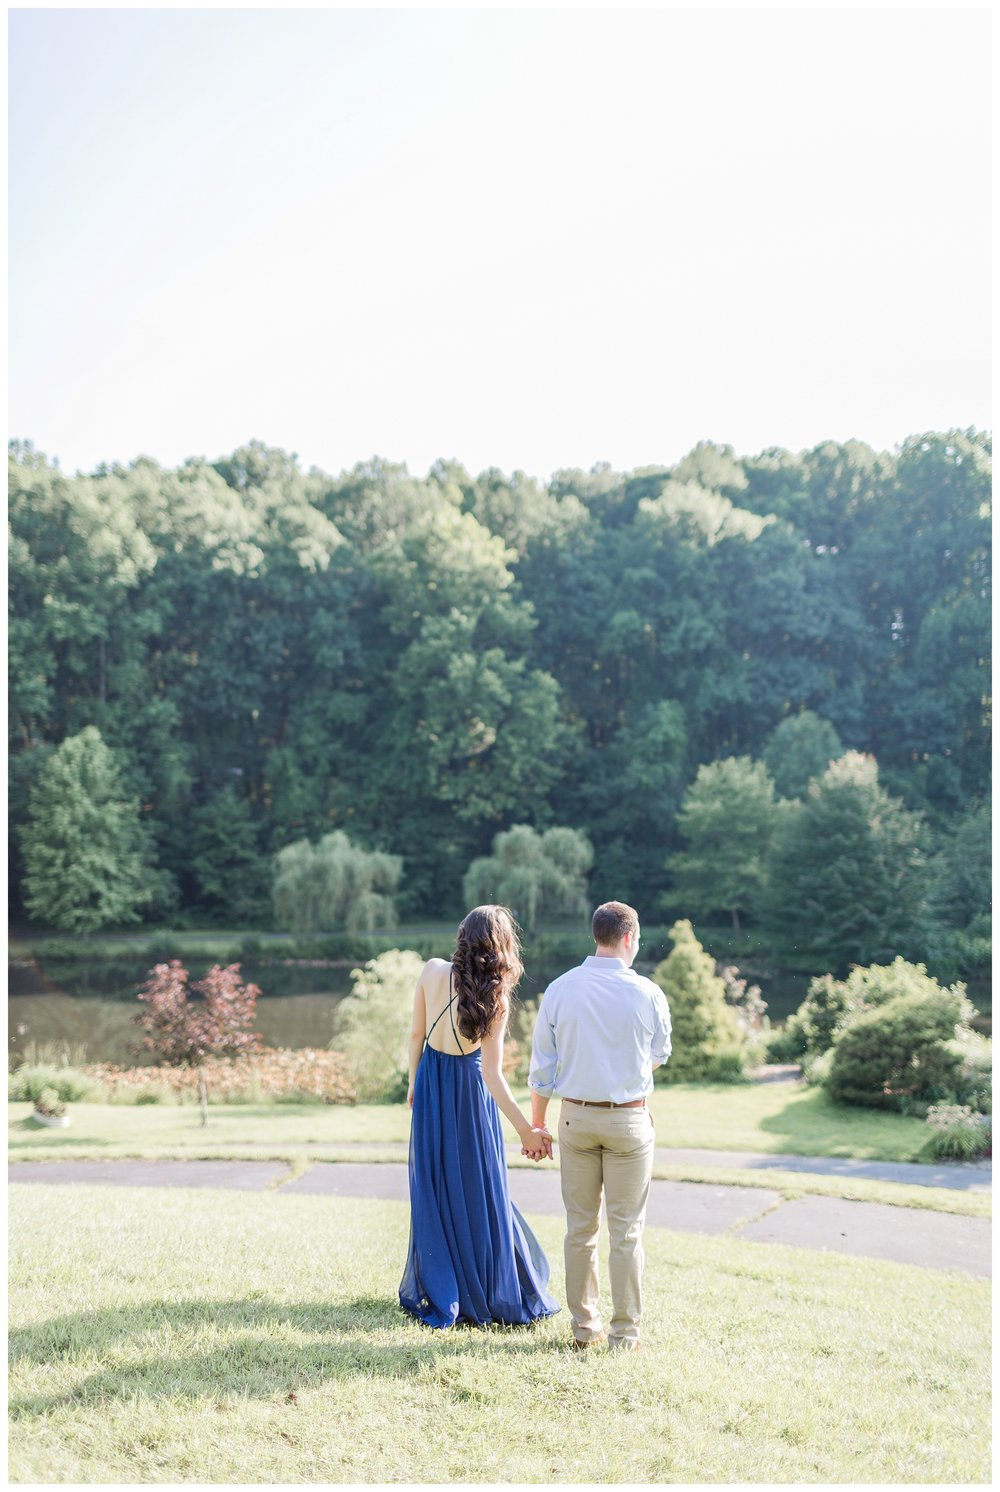 Meadowlark Botanical Garden Engagement | Virginia Wedding Photographer Kir Tuben_0015.jpg